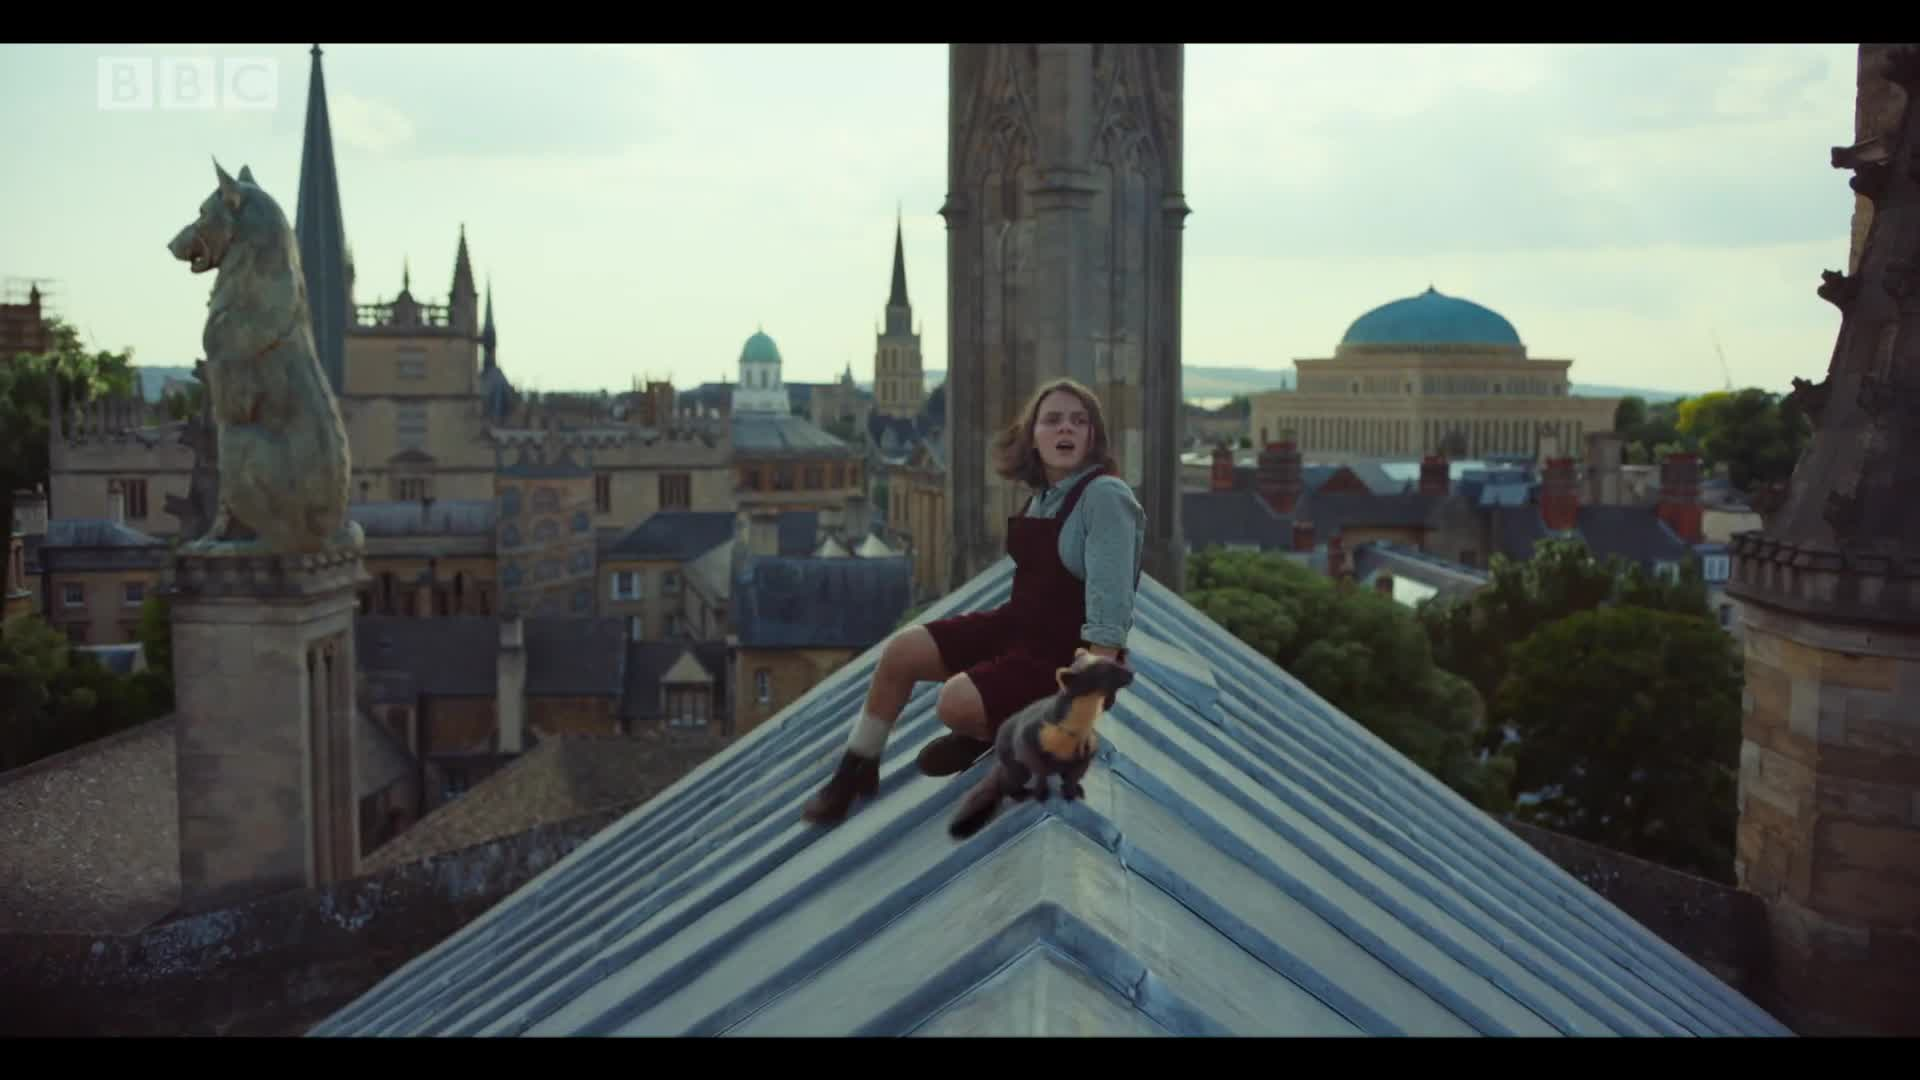 His Dark Materials Trailer - One Girl Will Change Worlds [HD] screen capture